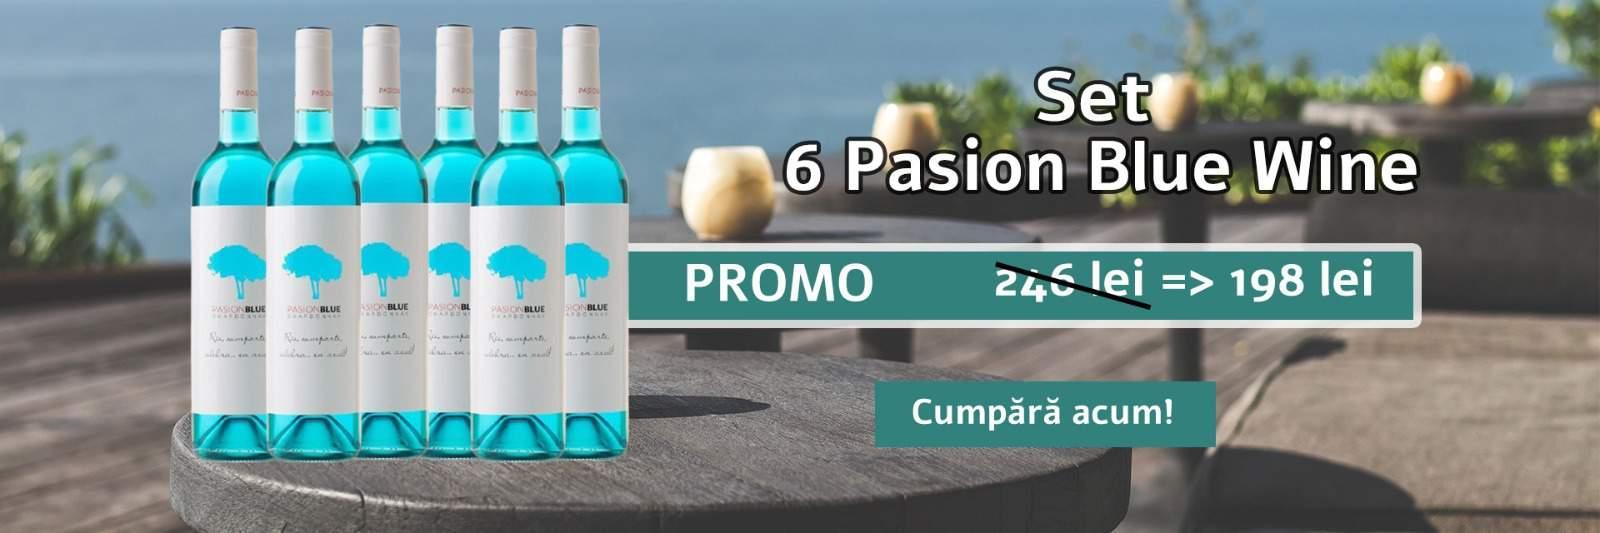 Promo Pasion Blue